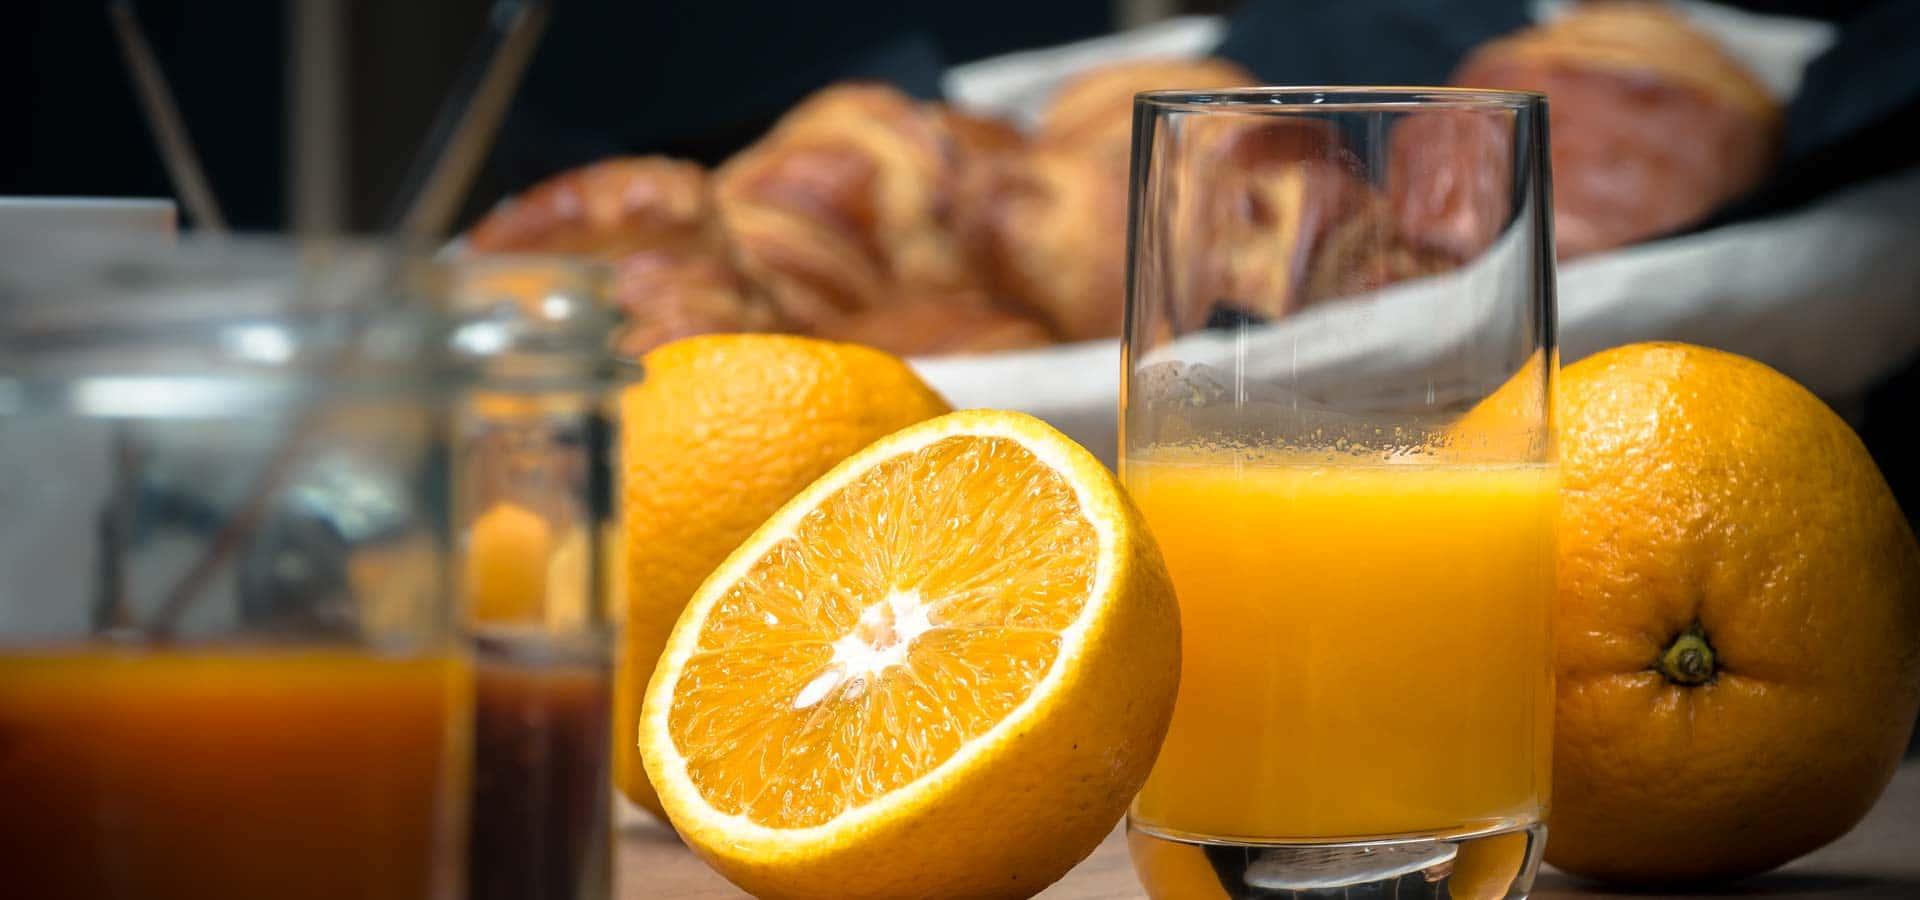 petit-dejeuner-buffet-reception-rennes